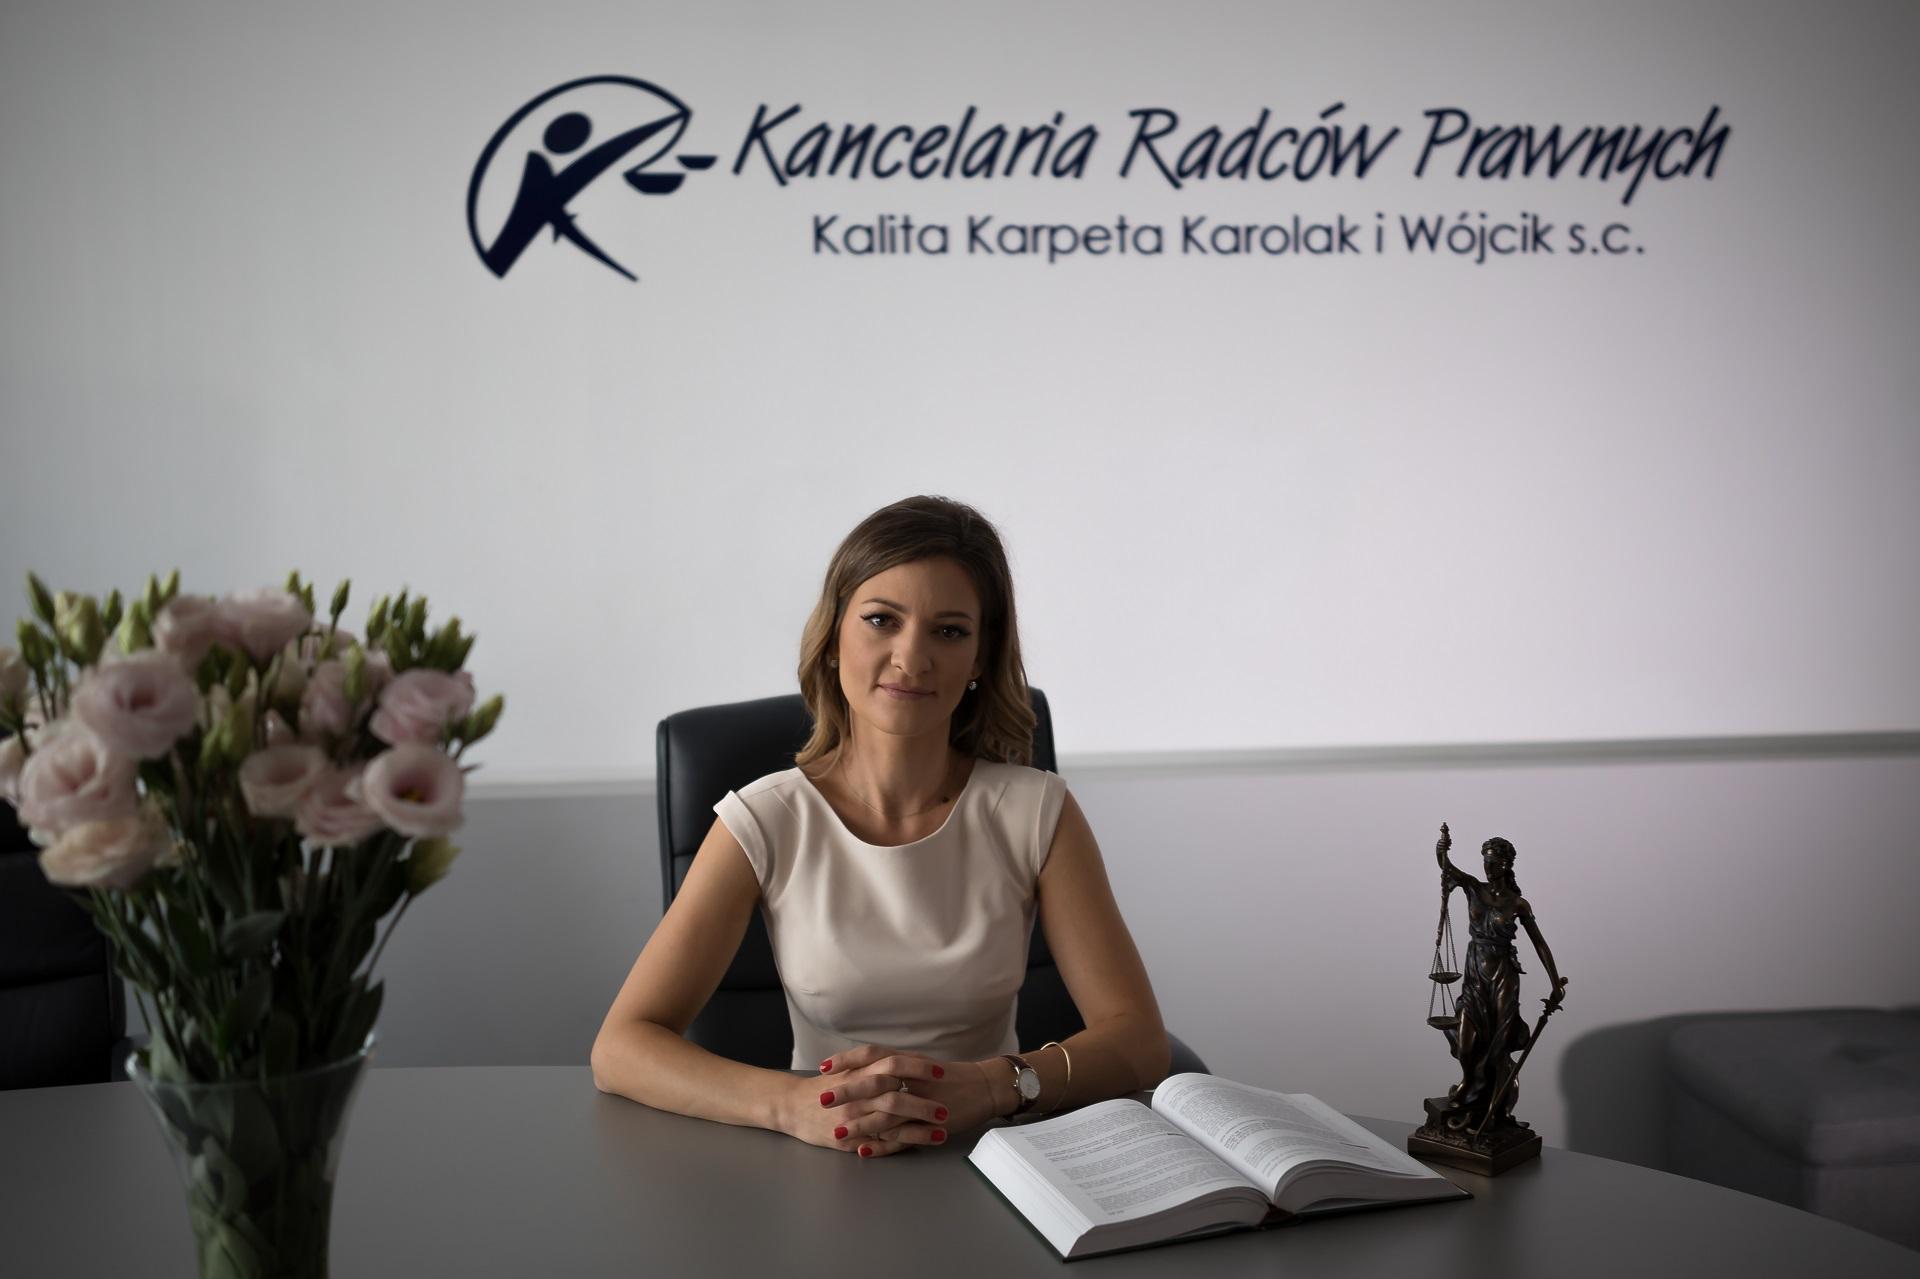 Hanna Karpińska-Karolak